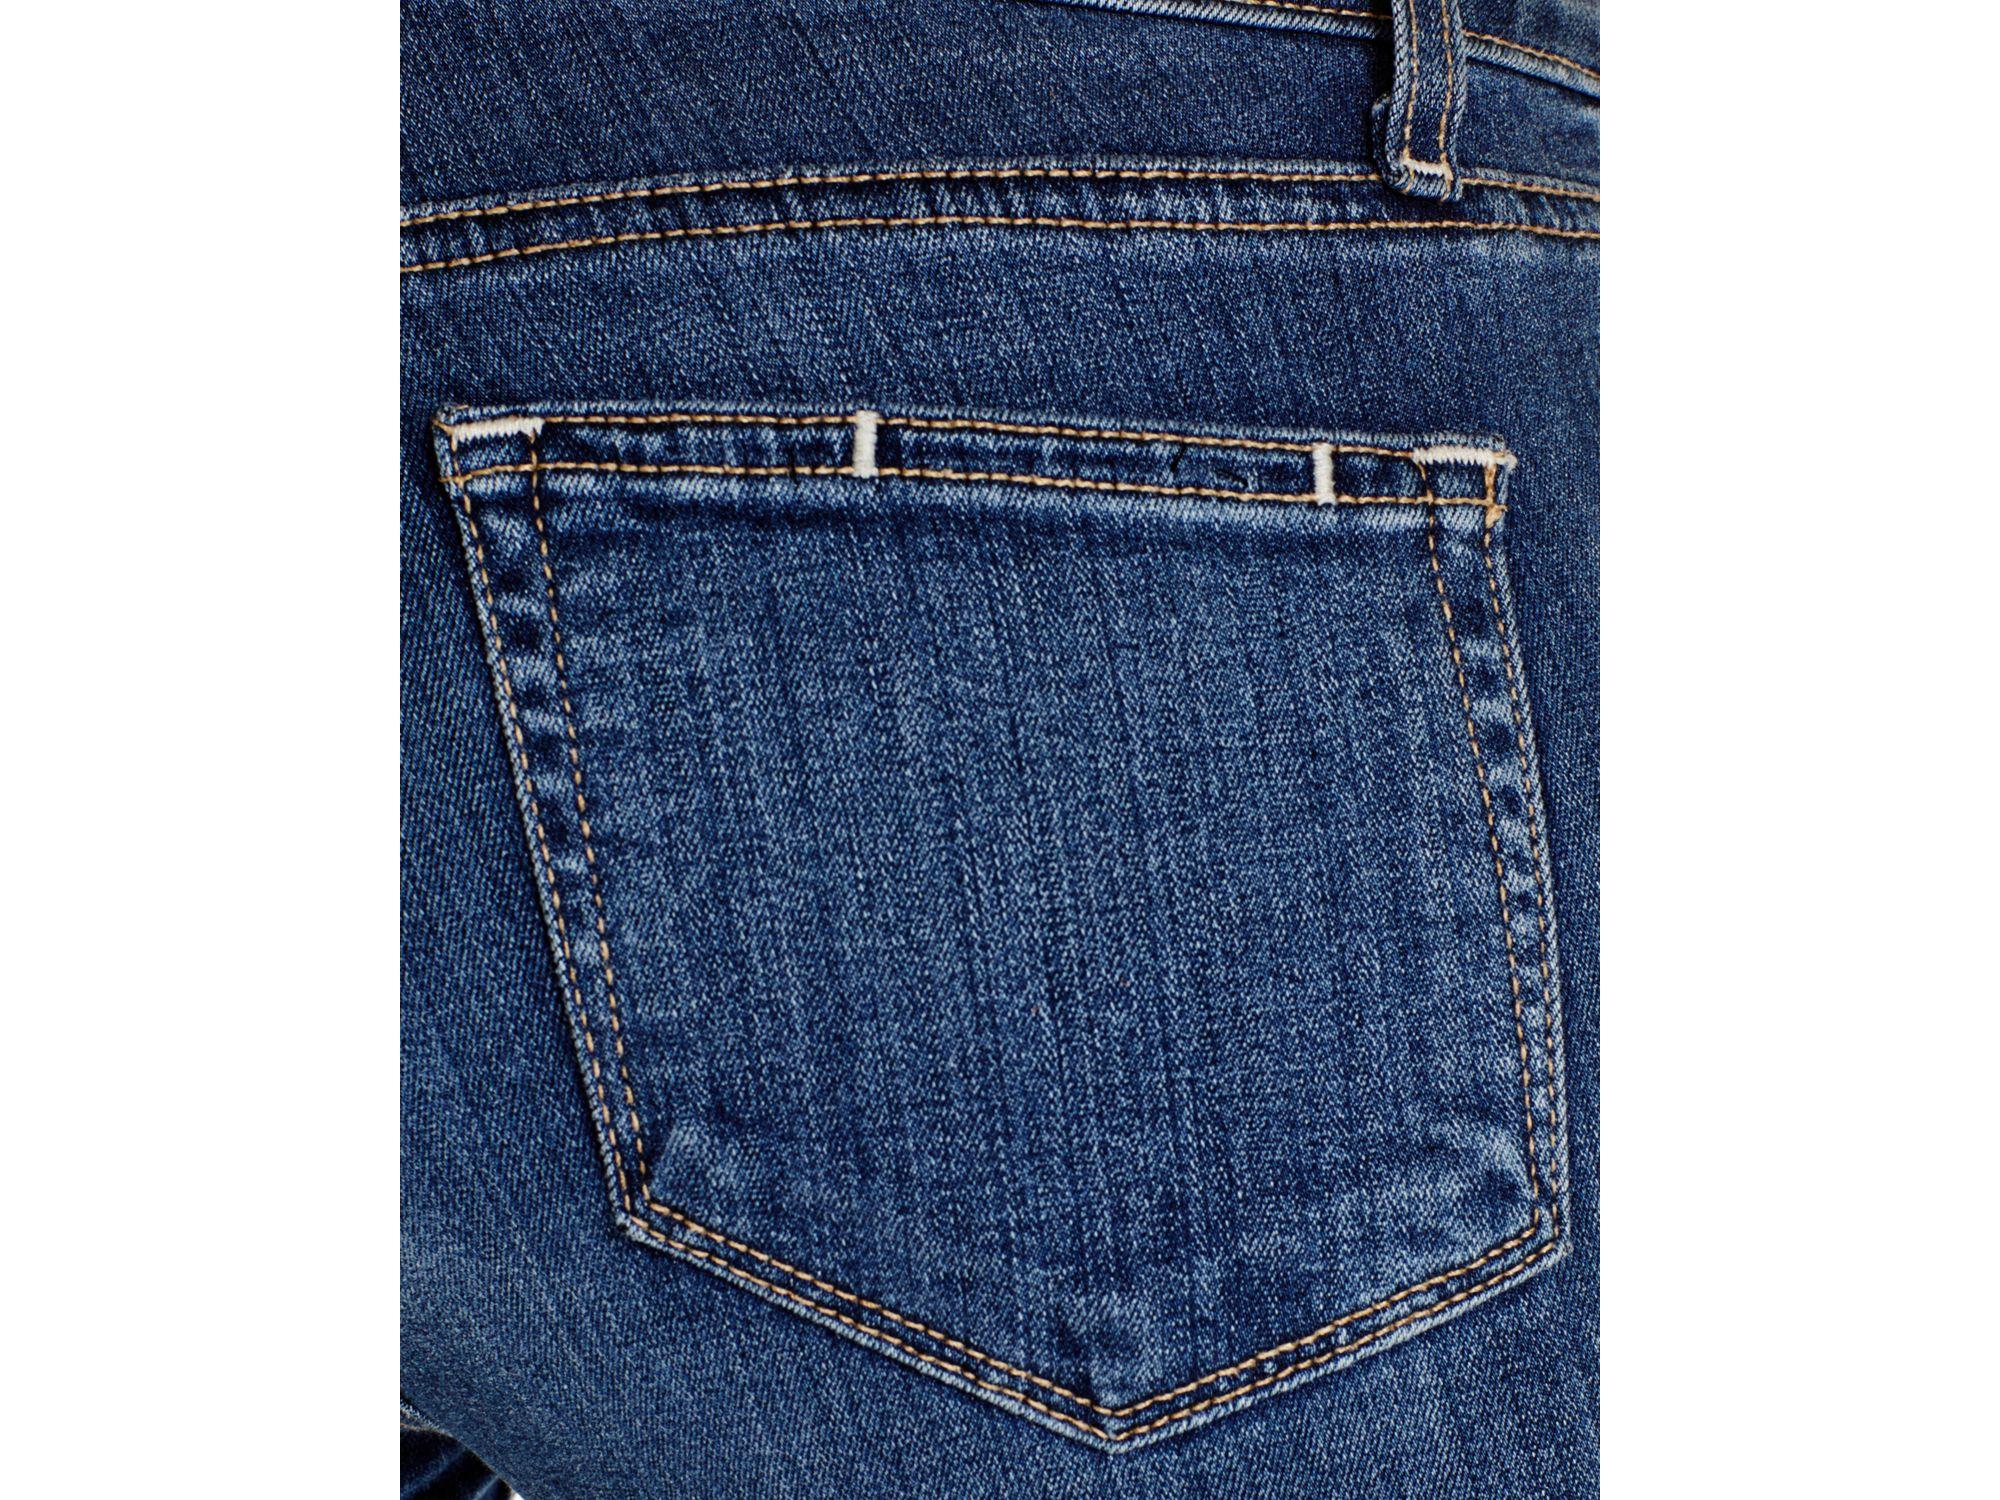 PAIGE Denim Verdugo Ankle Jeans In Tristan in Blue